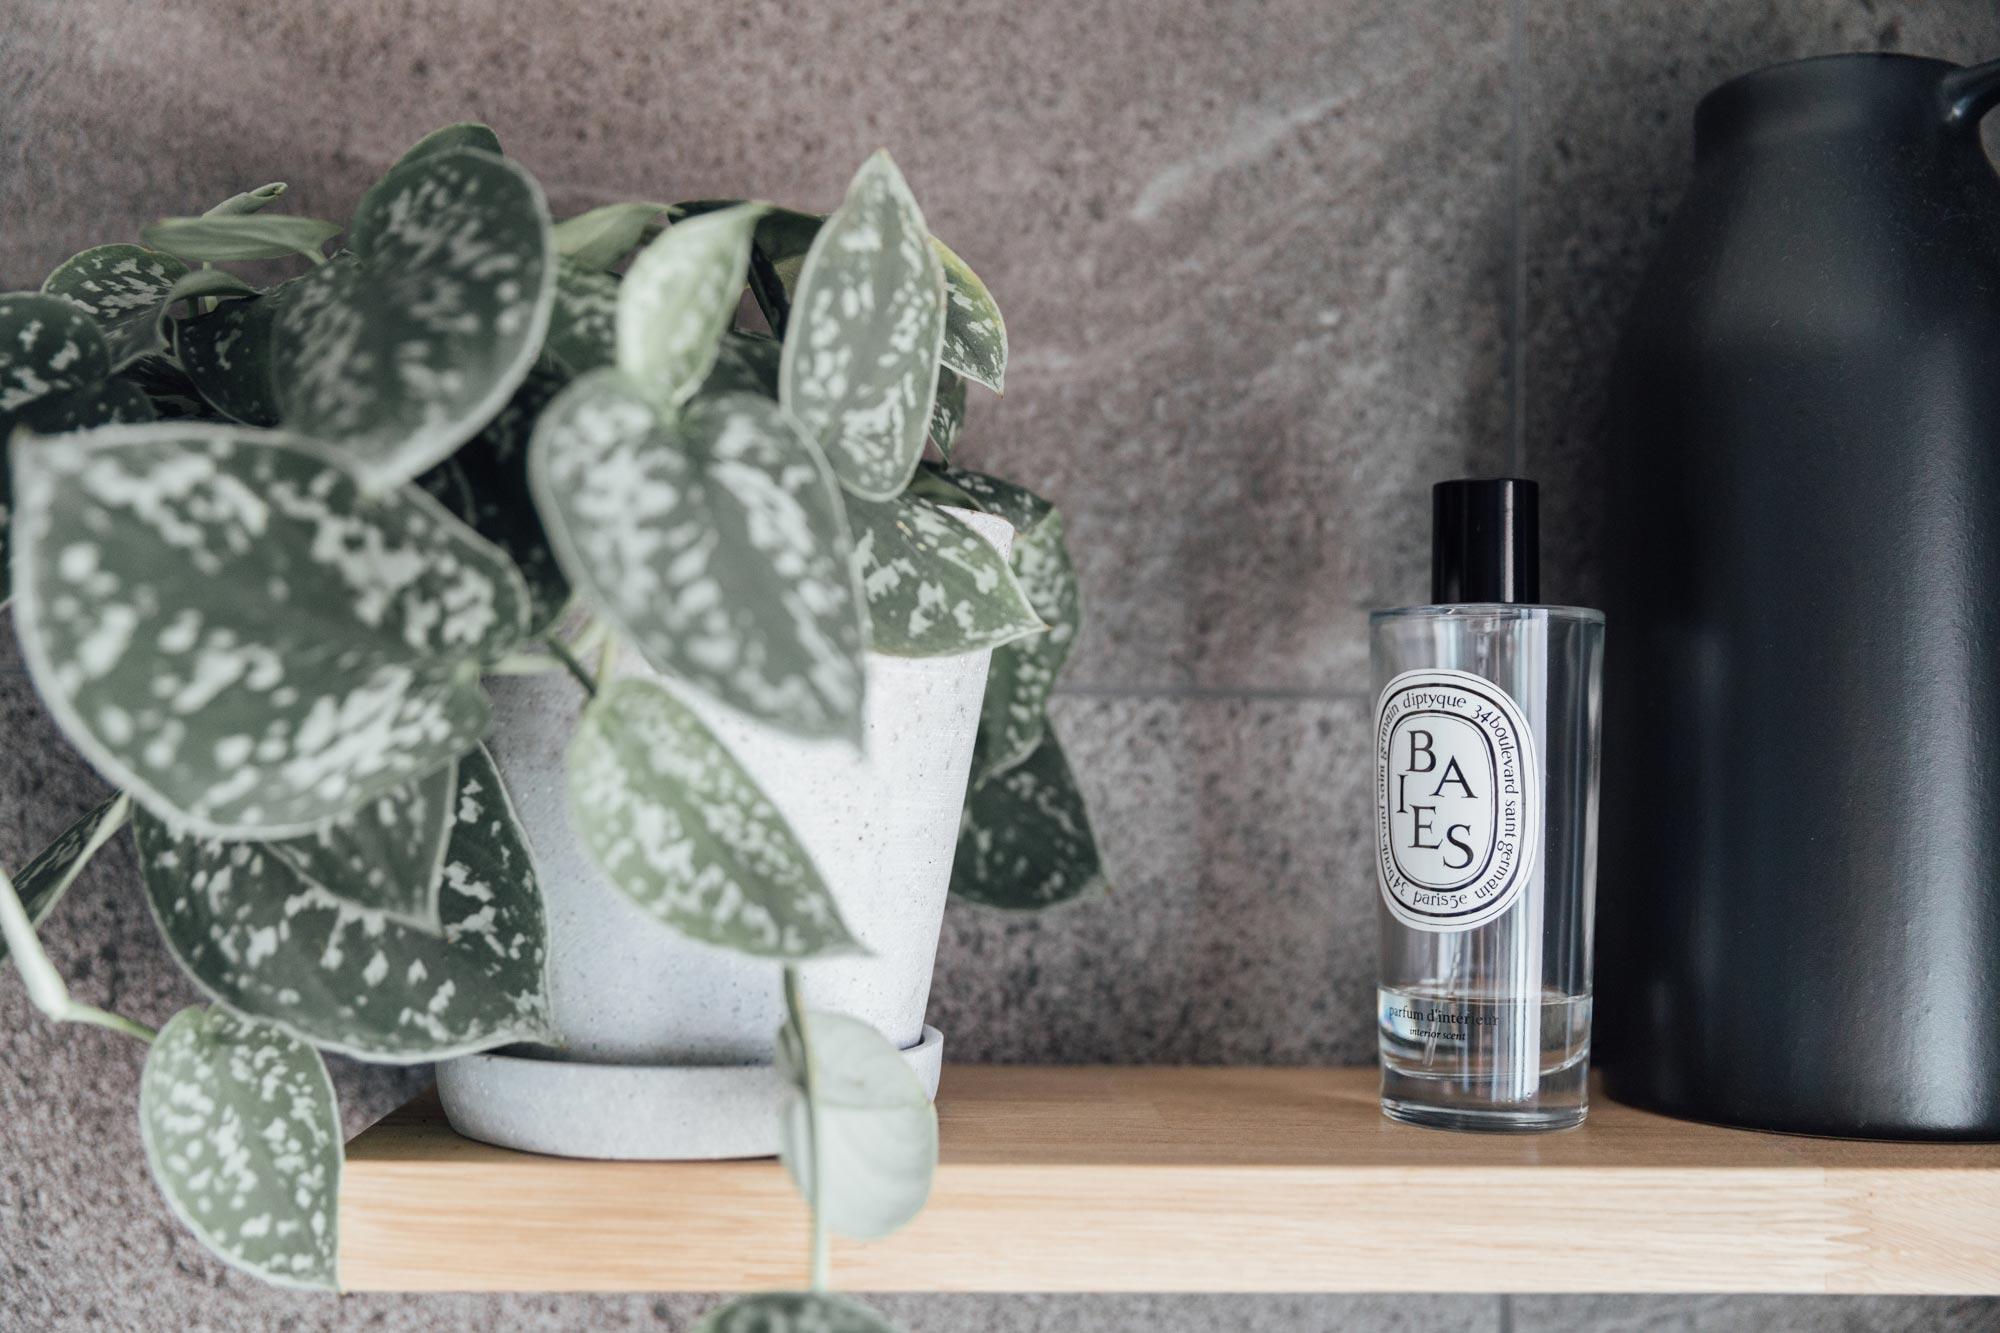 14 plants-and-dark-bathroom-accessories.jpg